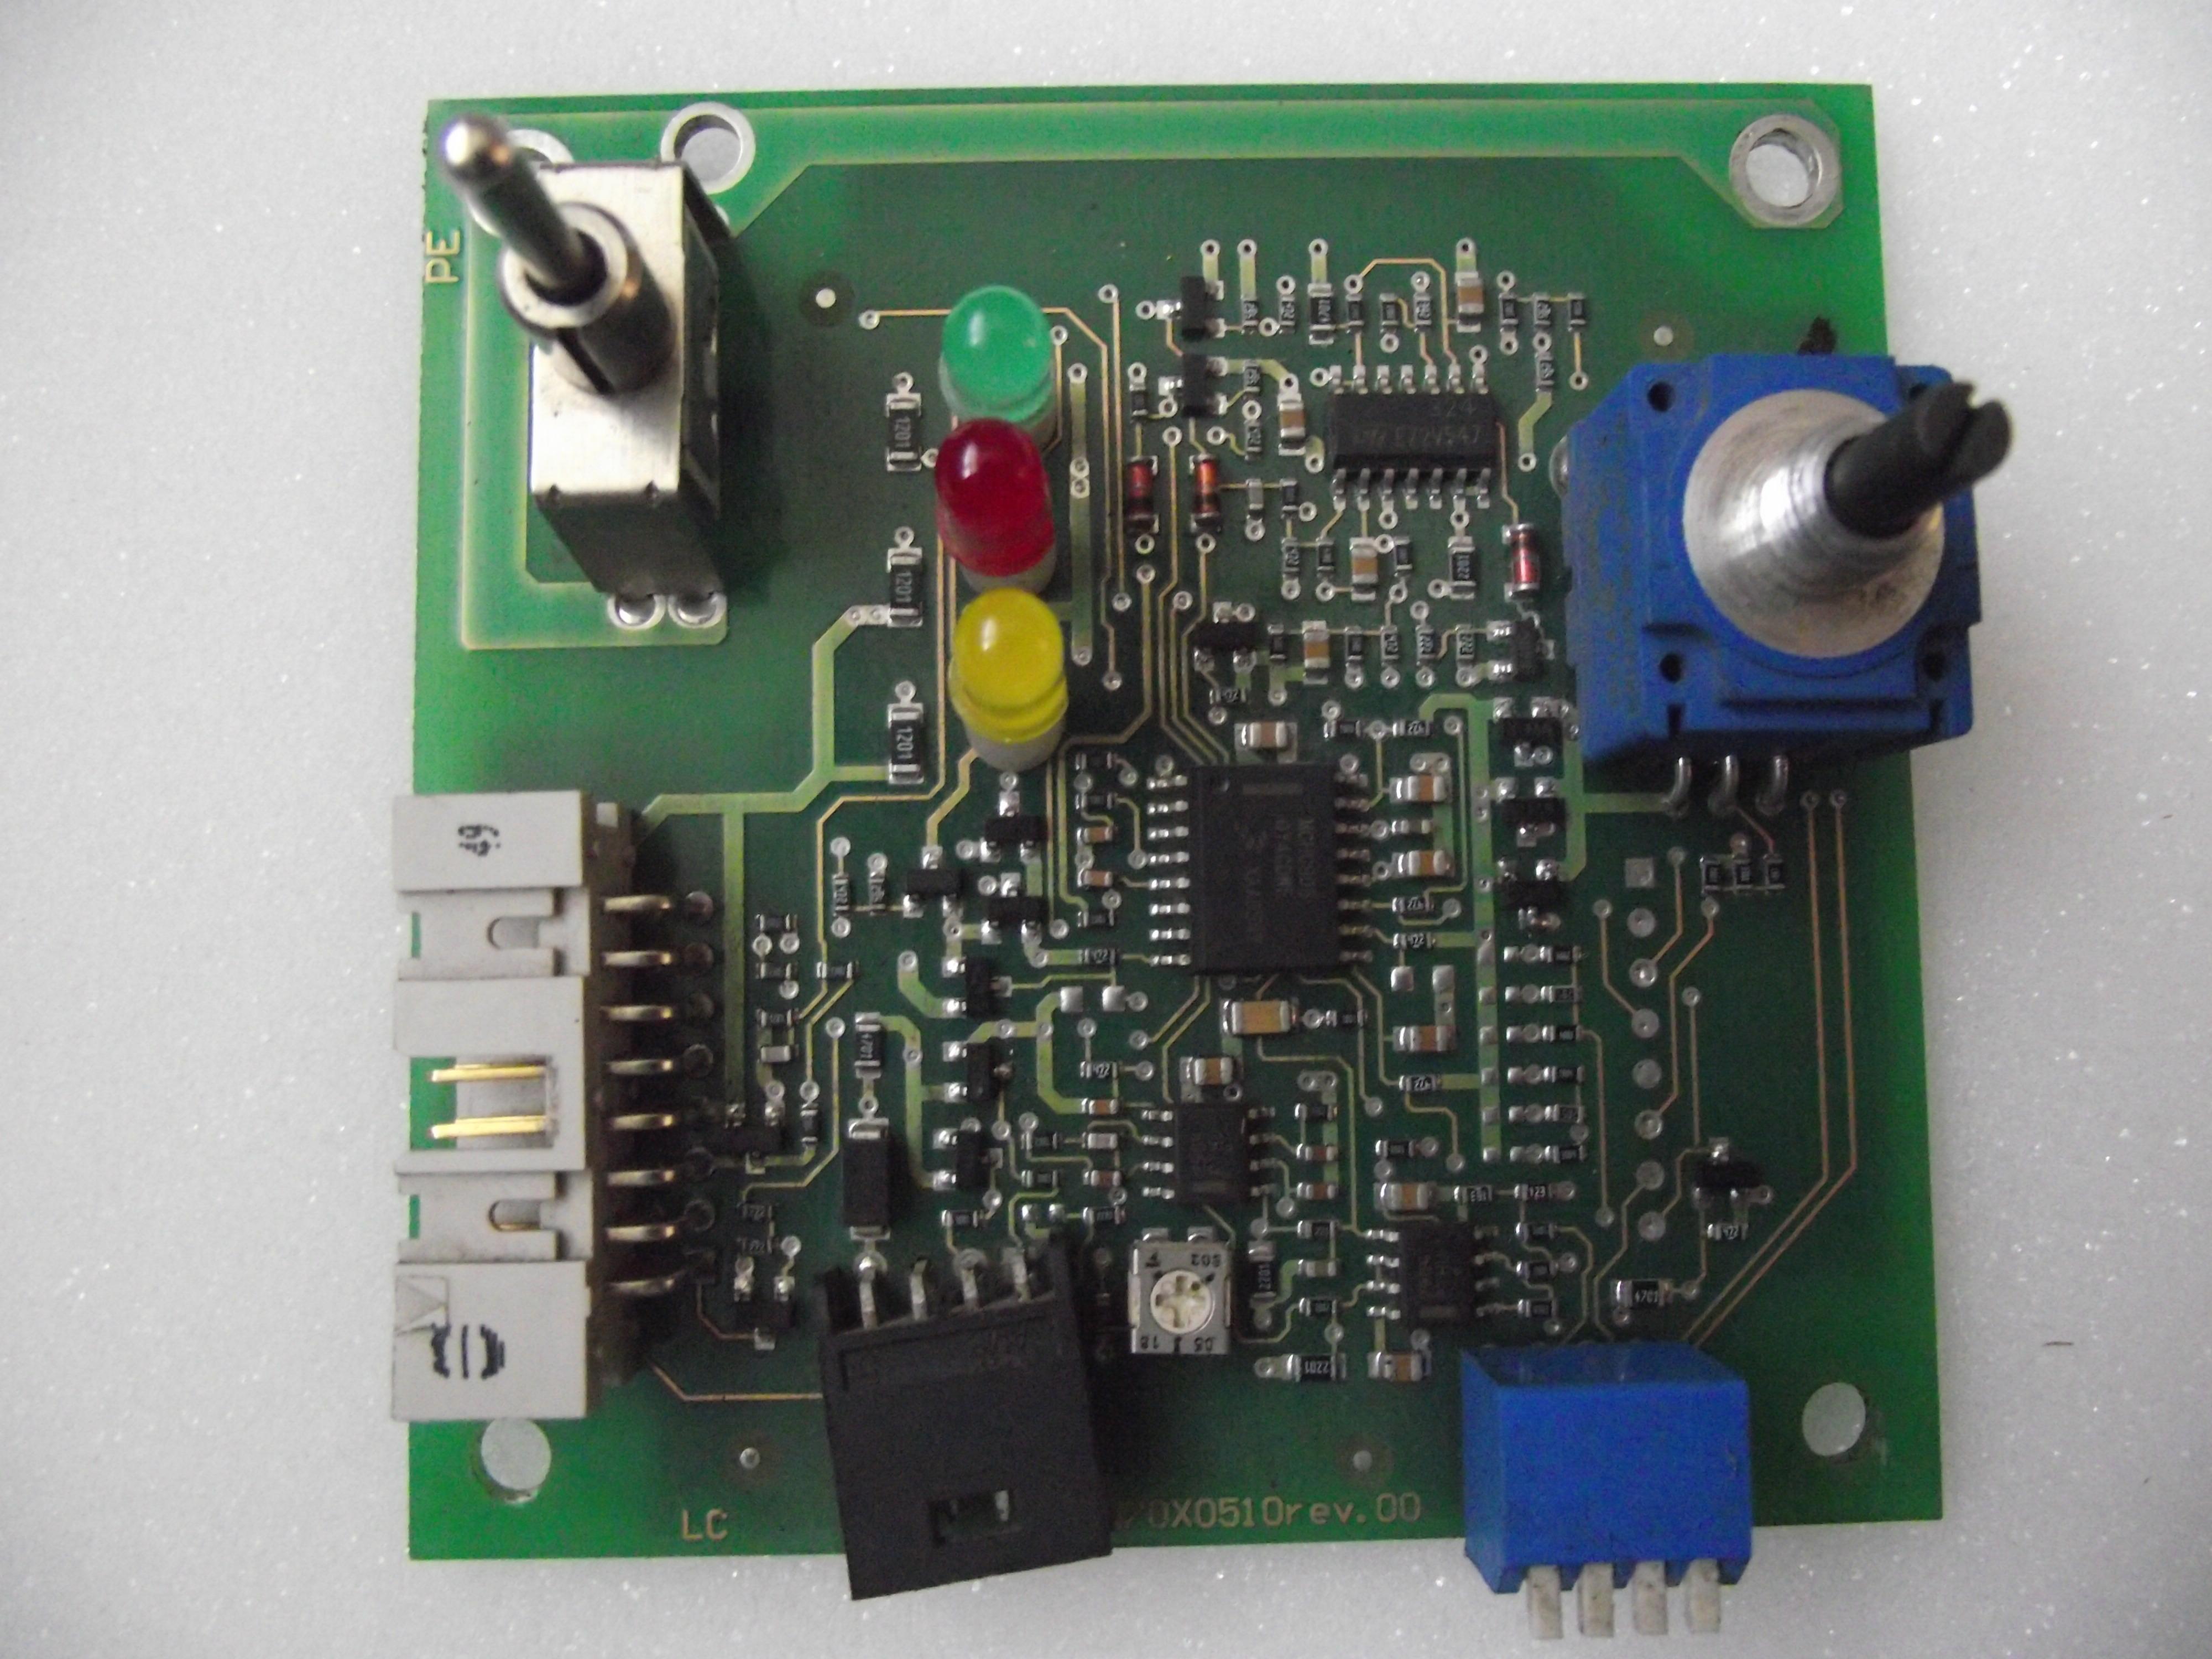 [Sprzedam] P�ytk� kontroln� spawarki Lincoln Electric Invertec V145-S